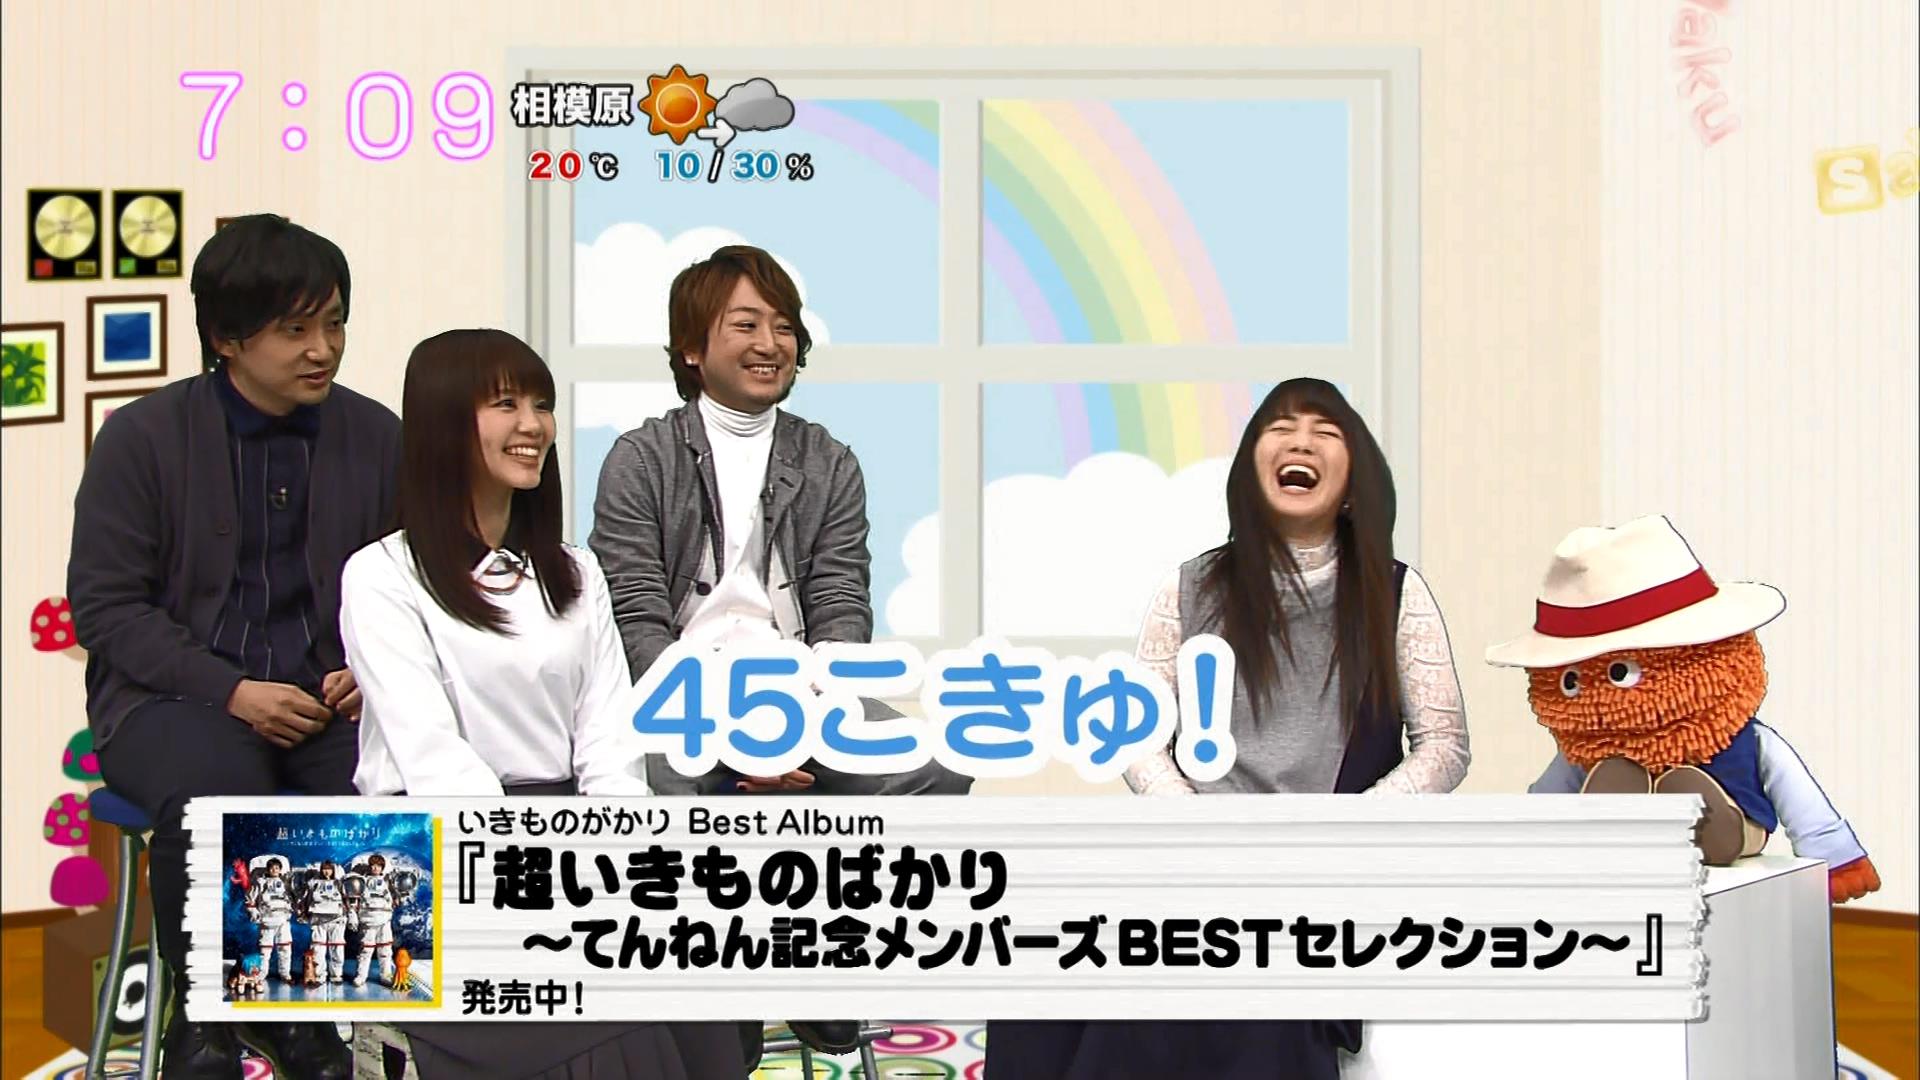 2016.03.18 いきものがかり(saku saku).ts_20160318_102335.319